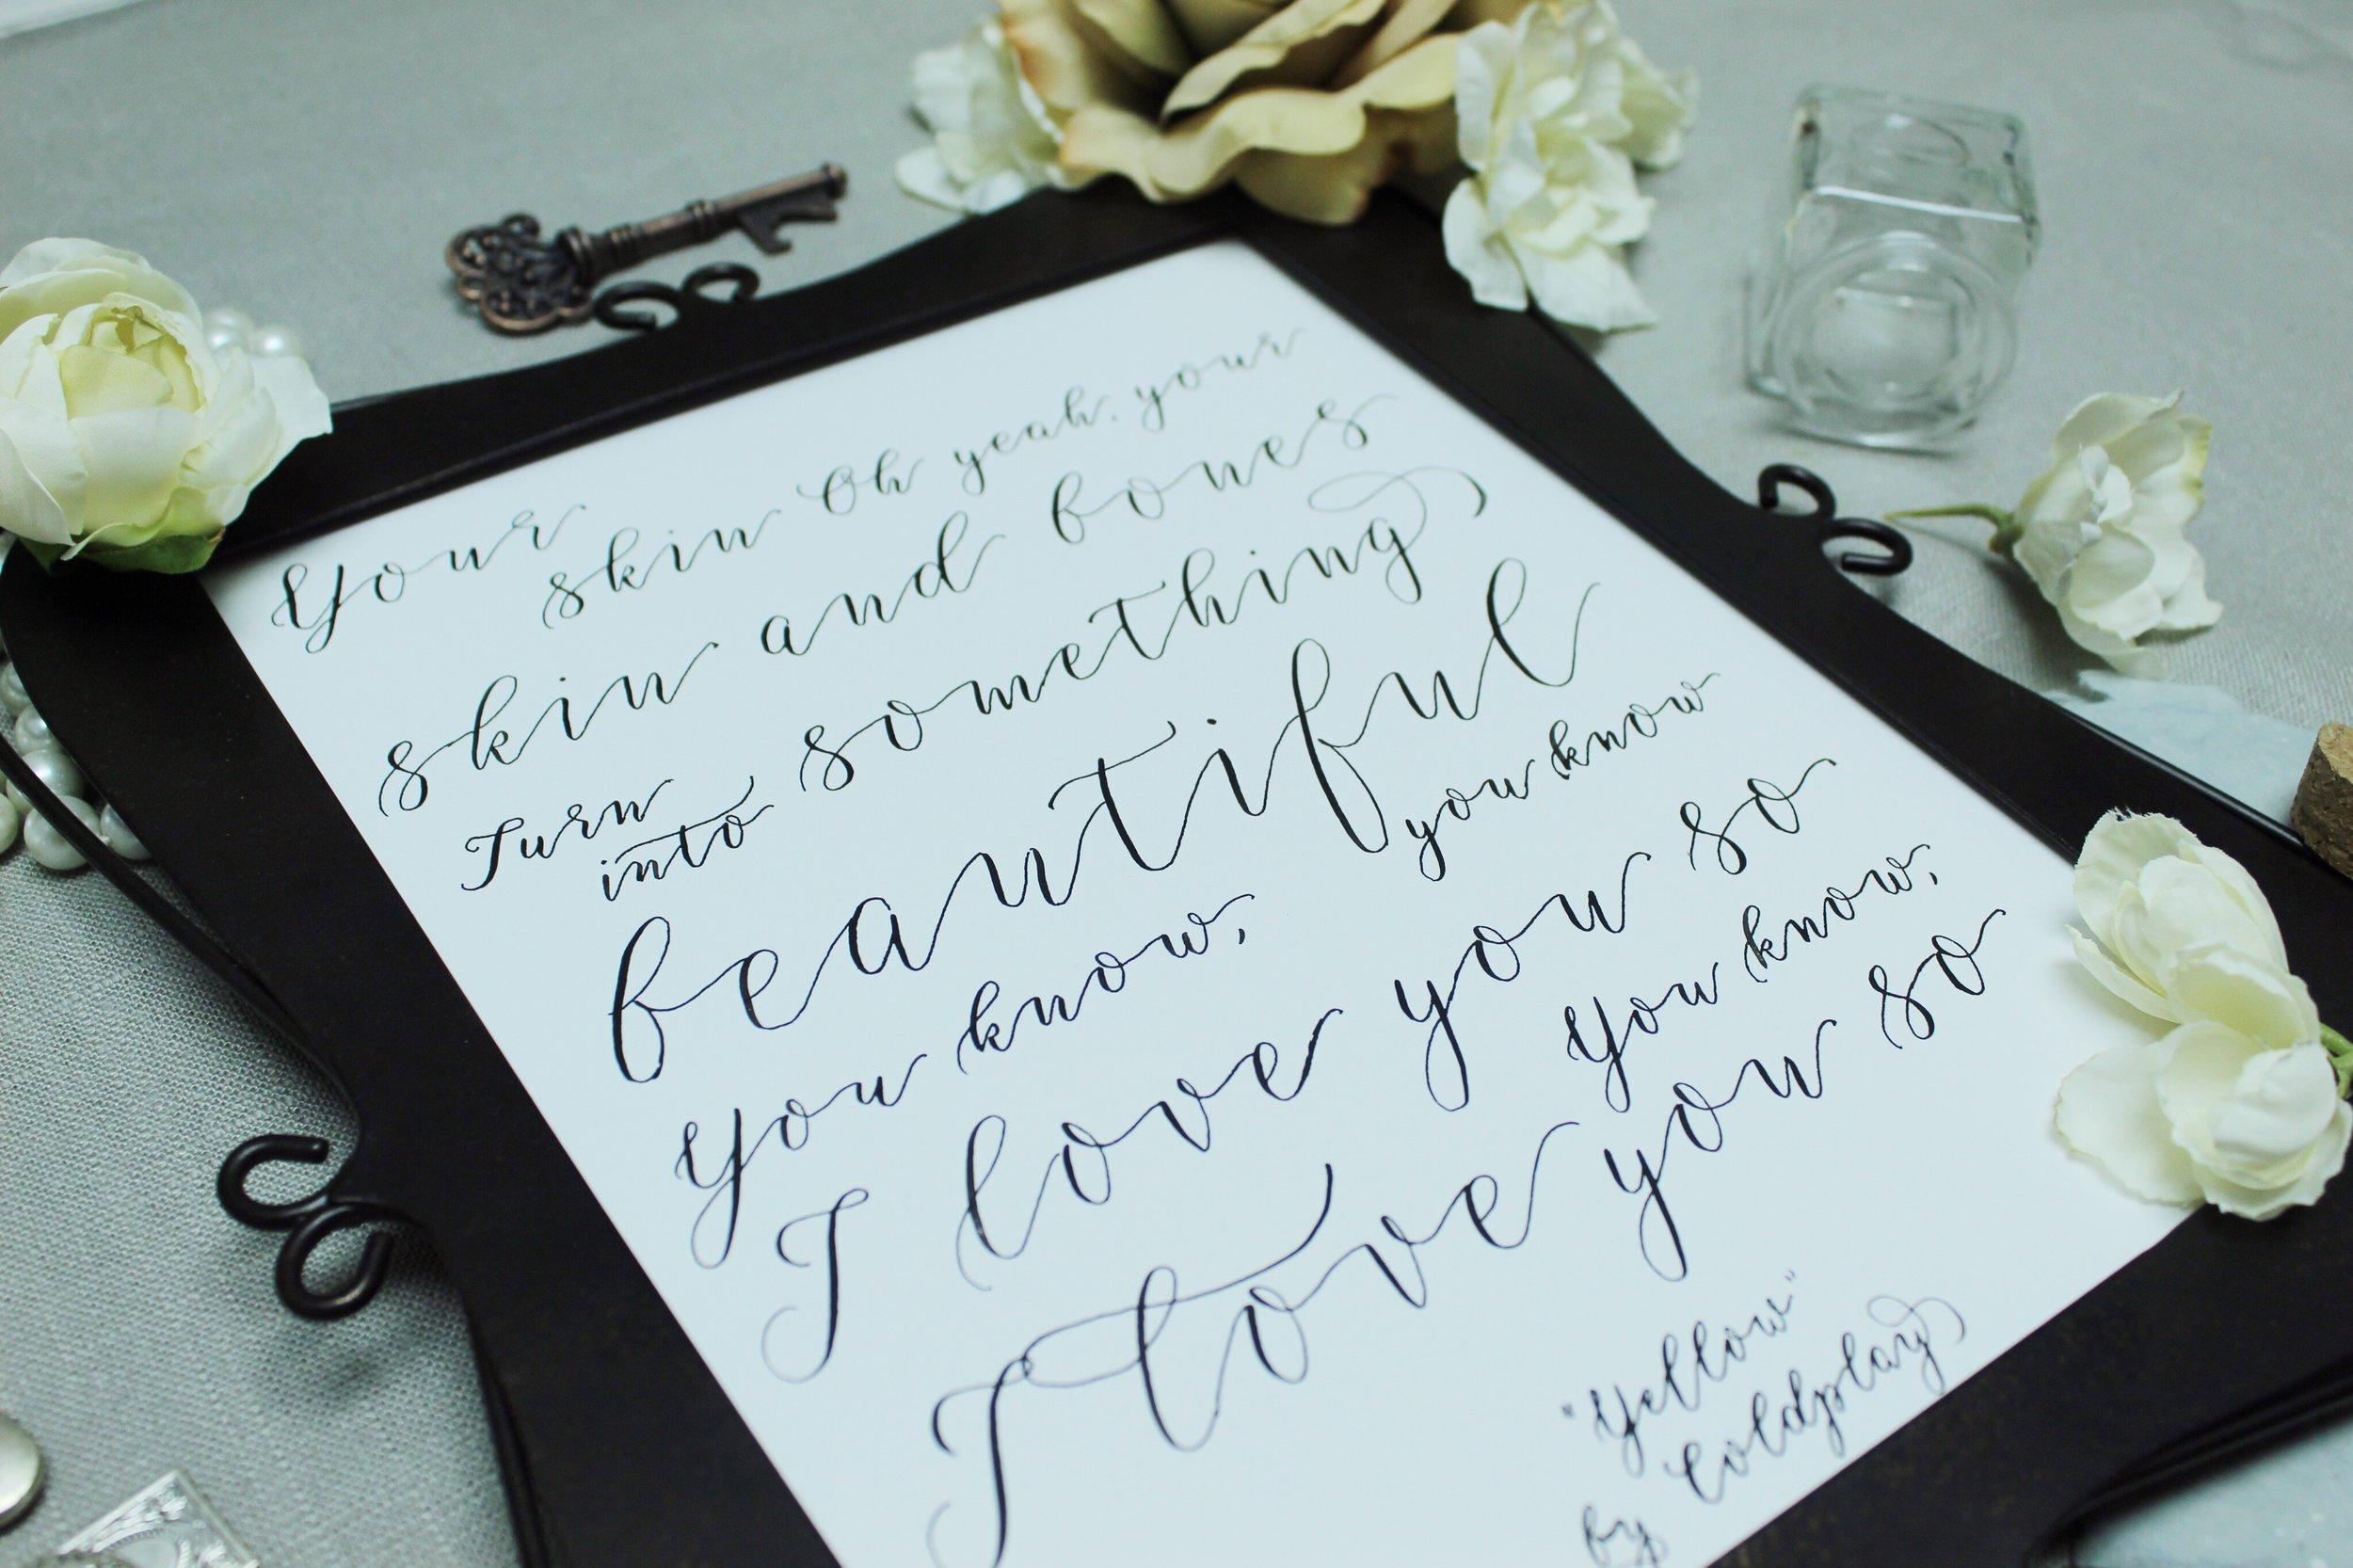 Central PA, York PA, JesSmith Designs, custom, wedding, invitations, bridal, announcements, save the date, baby, hanover, calligraphy, baltimore, wedding invitations, lancaster, gettysburg-05-13 22.15.22.jpg